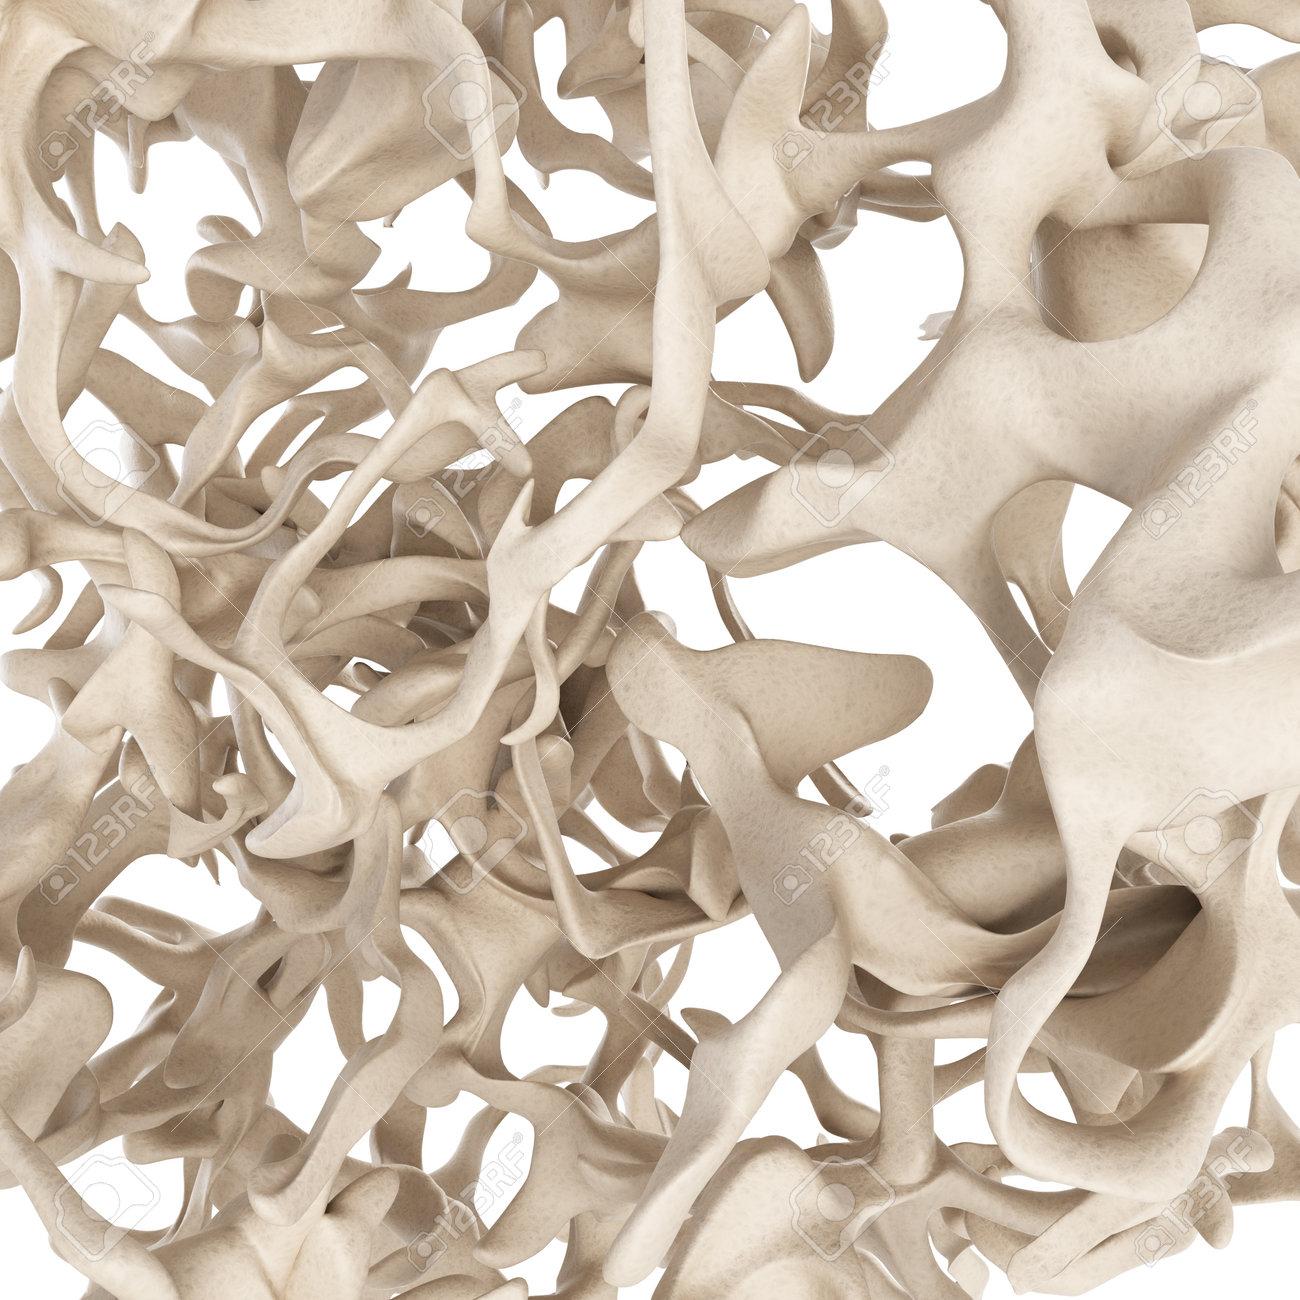 scientific illustration - osteoporosis bone structure - 27227657